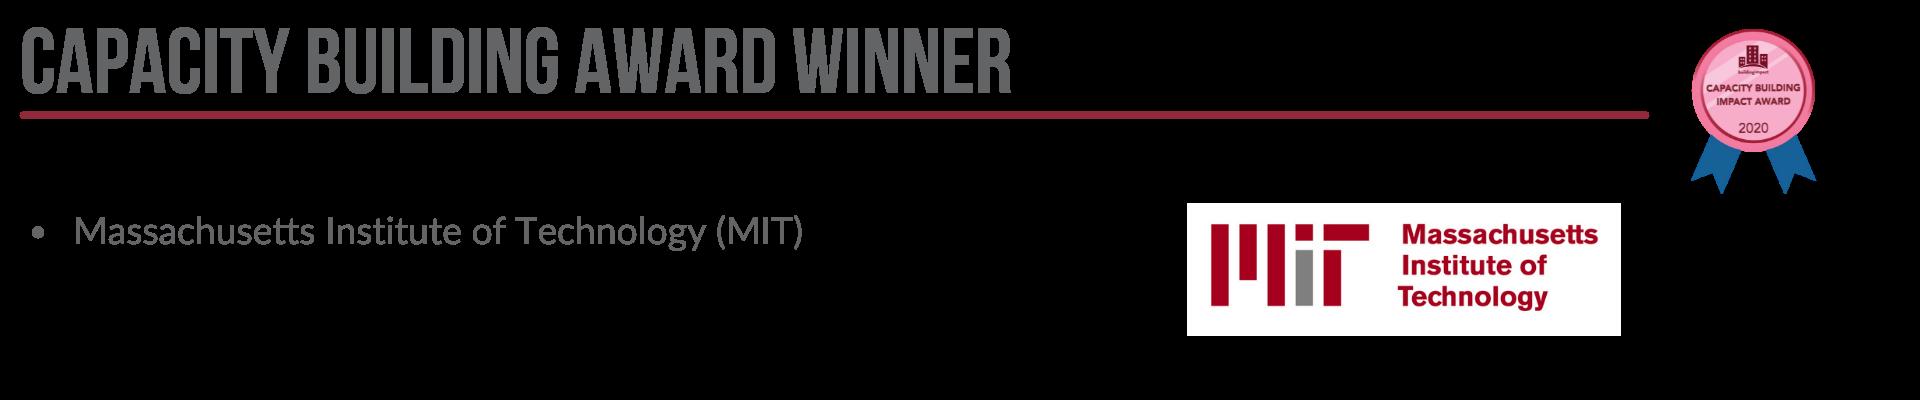 Capacity Building Award Winner: Massachusetts Institute of Technology (MIT)